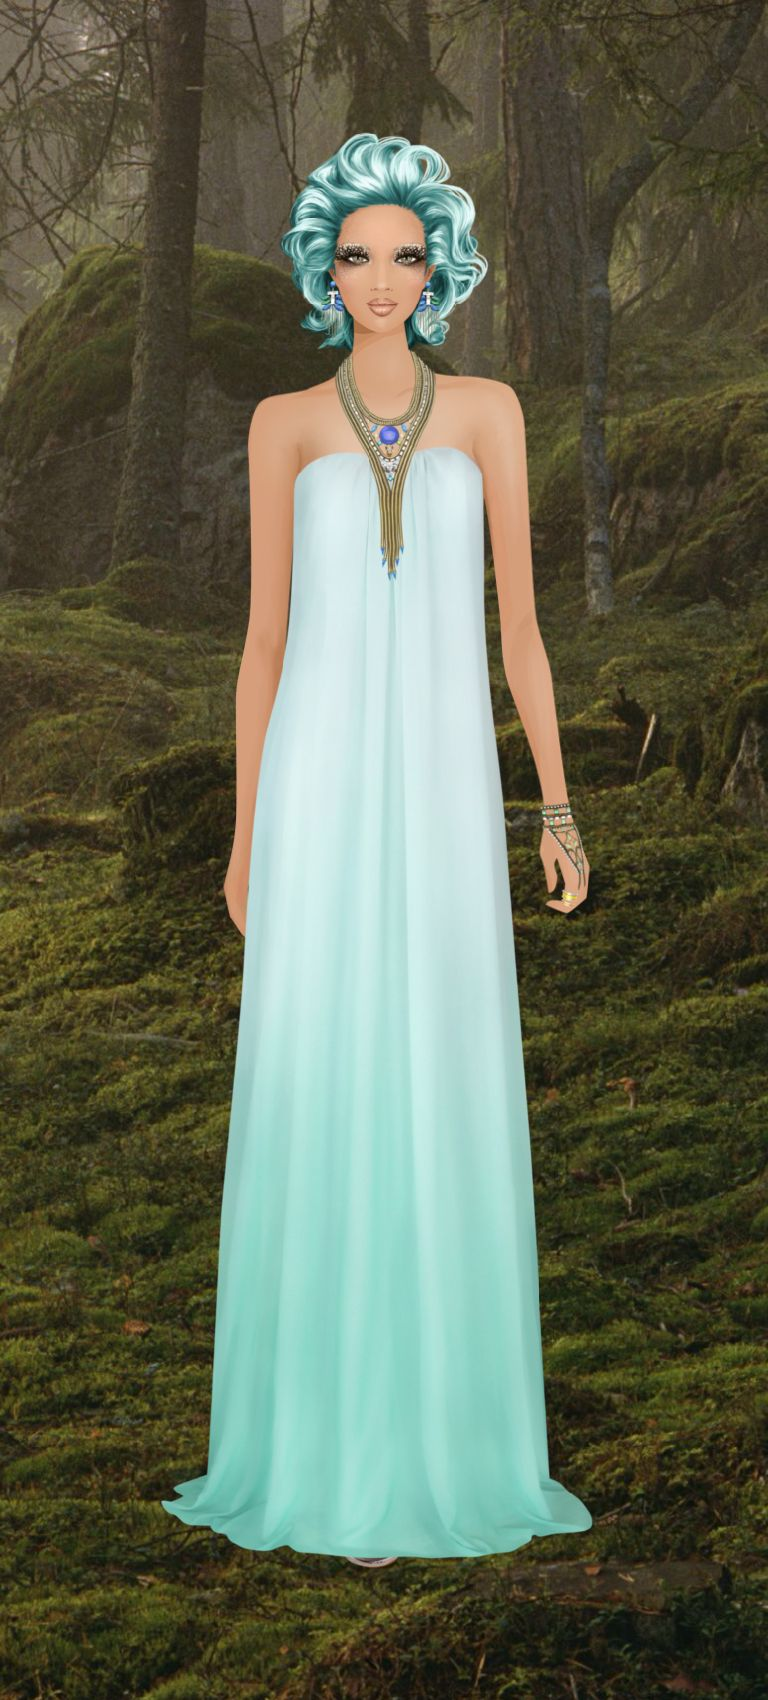 Fashion Game | Covet Fashion Board | Pinterest | Fashion boards